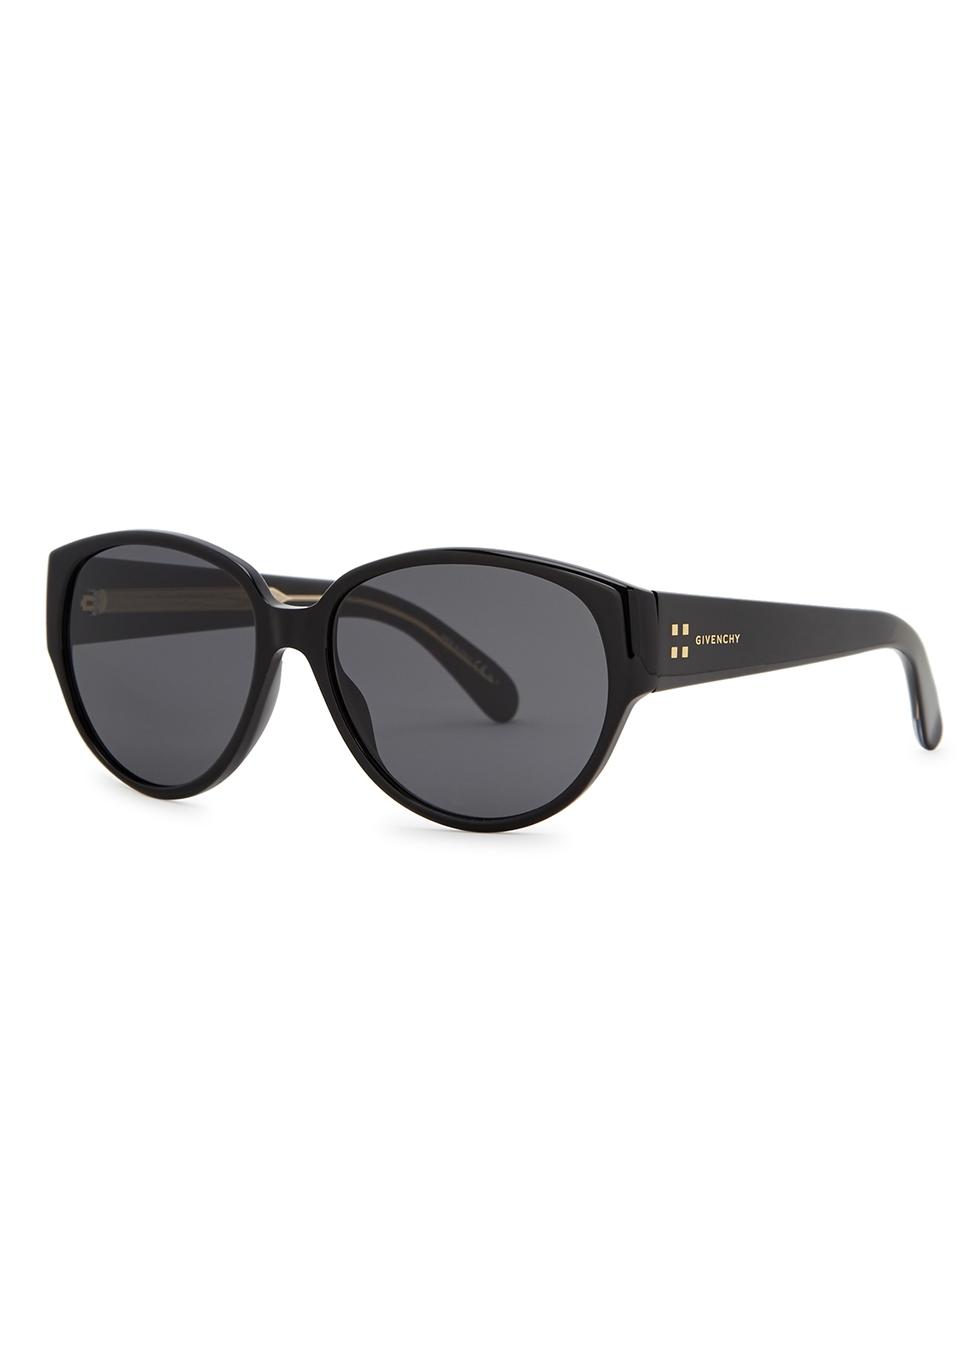 caab904d5 Givenchy Women's Sunglasses - Harvey Nichols